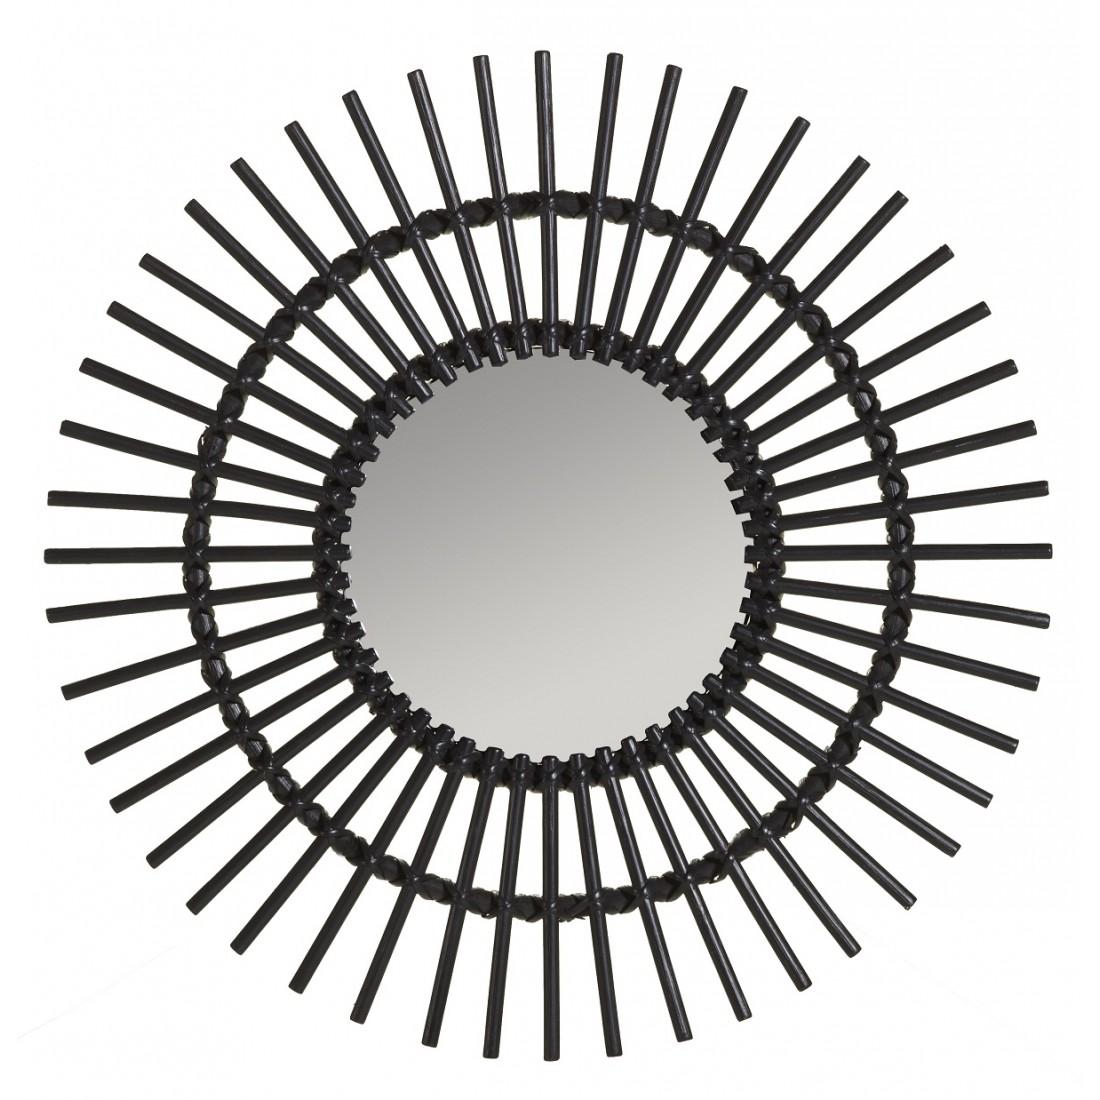 Miroir rotin laqu noir vintage soleil miroir rotin kok maison - Miroir en rotin ...